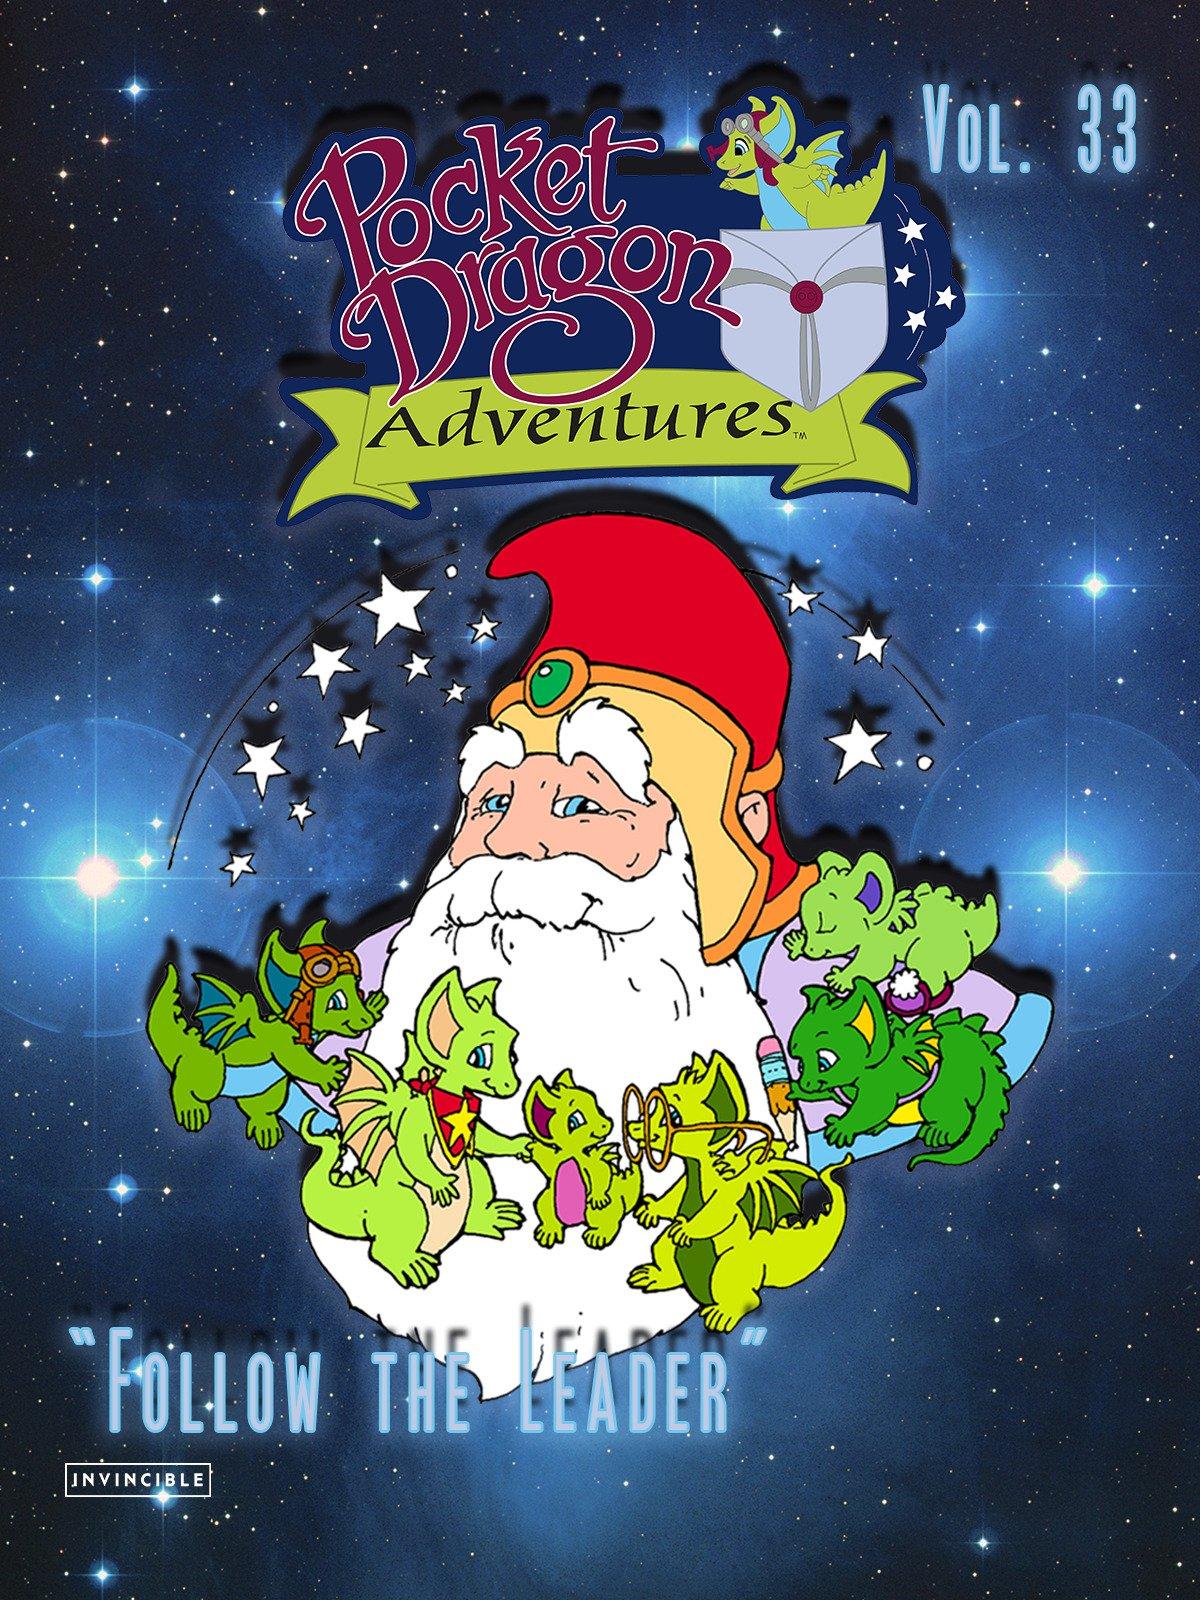 Pocket Dragon Adventures Vol. 33Follow the Leader